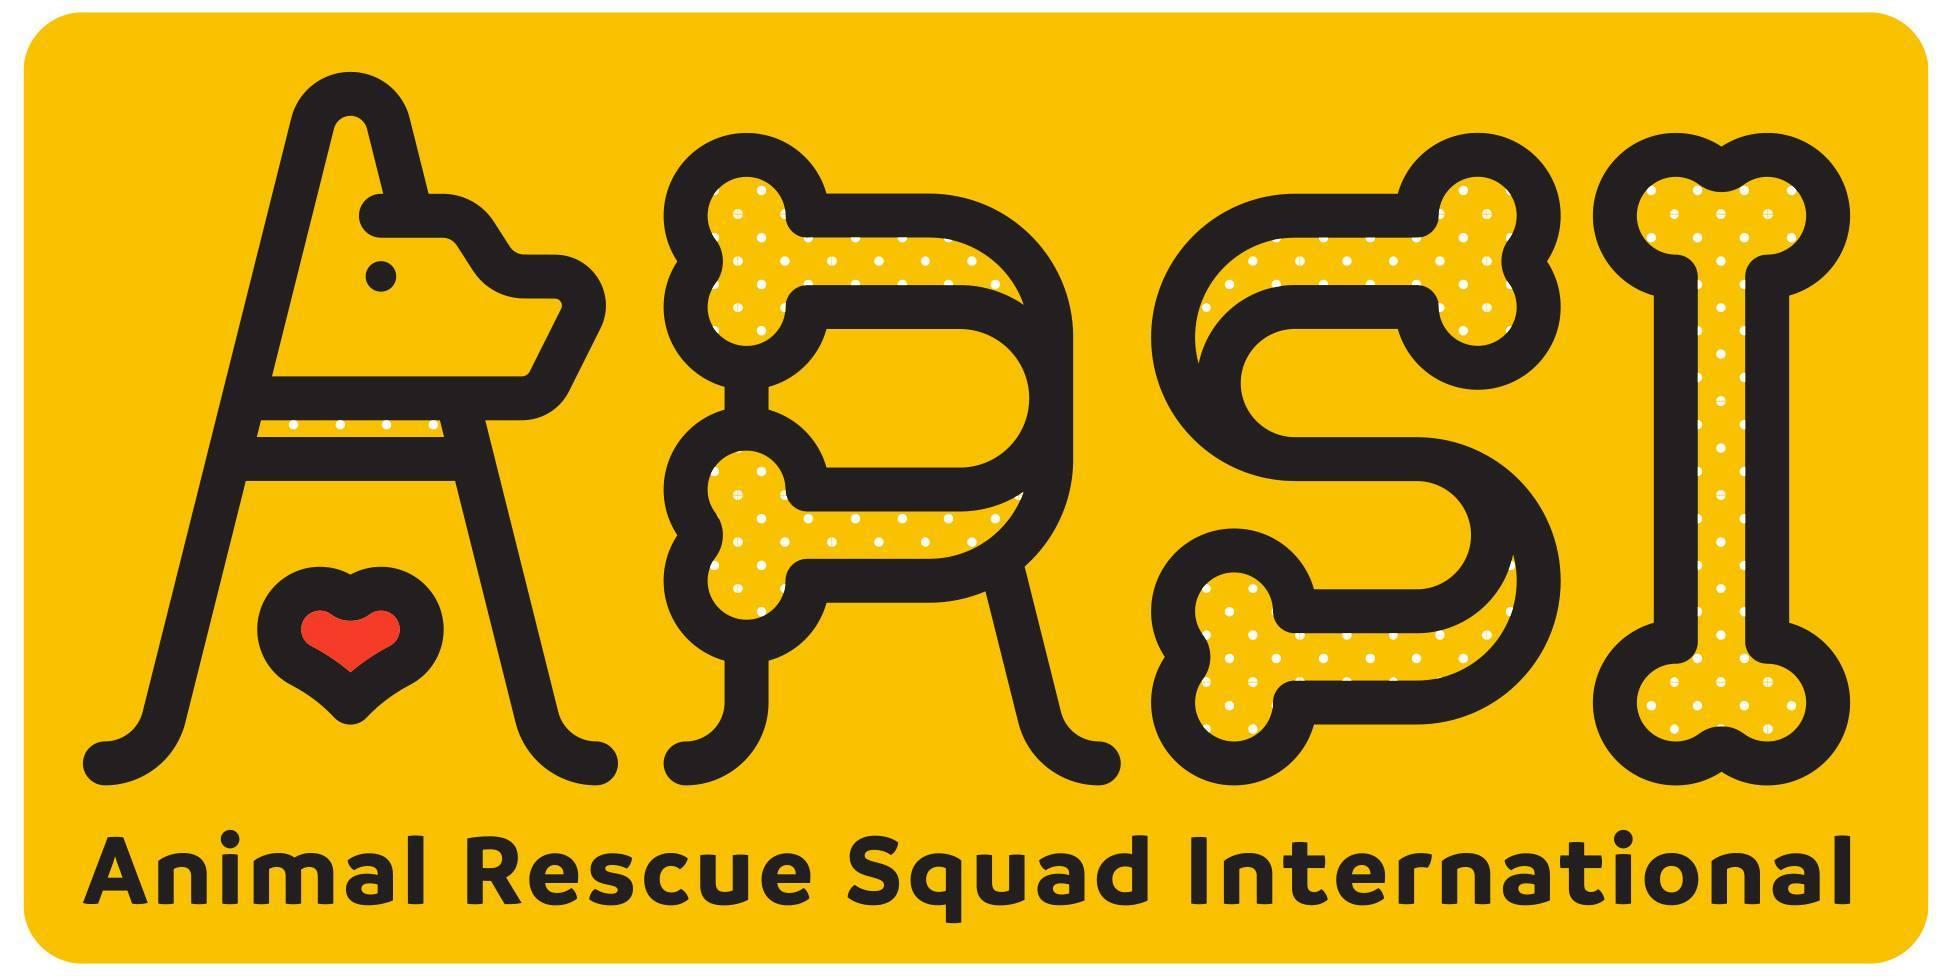 Animal Rescue Squad International